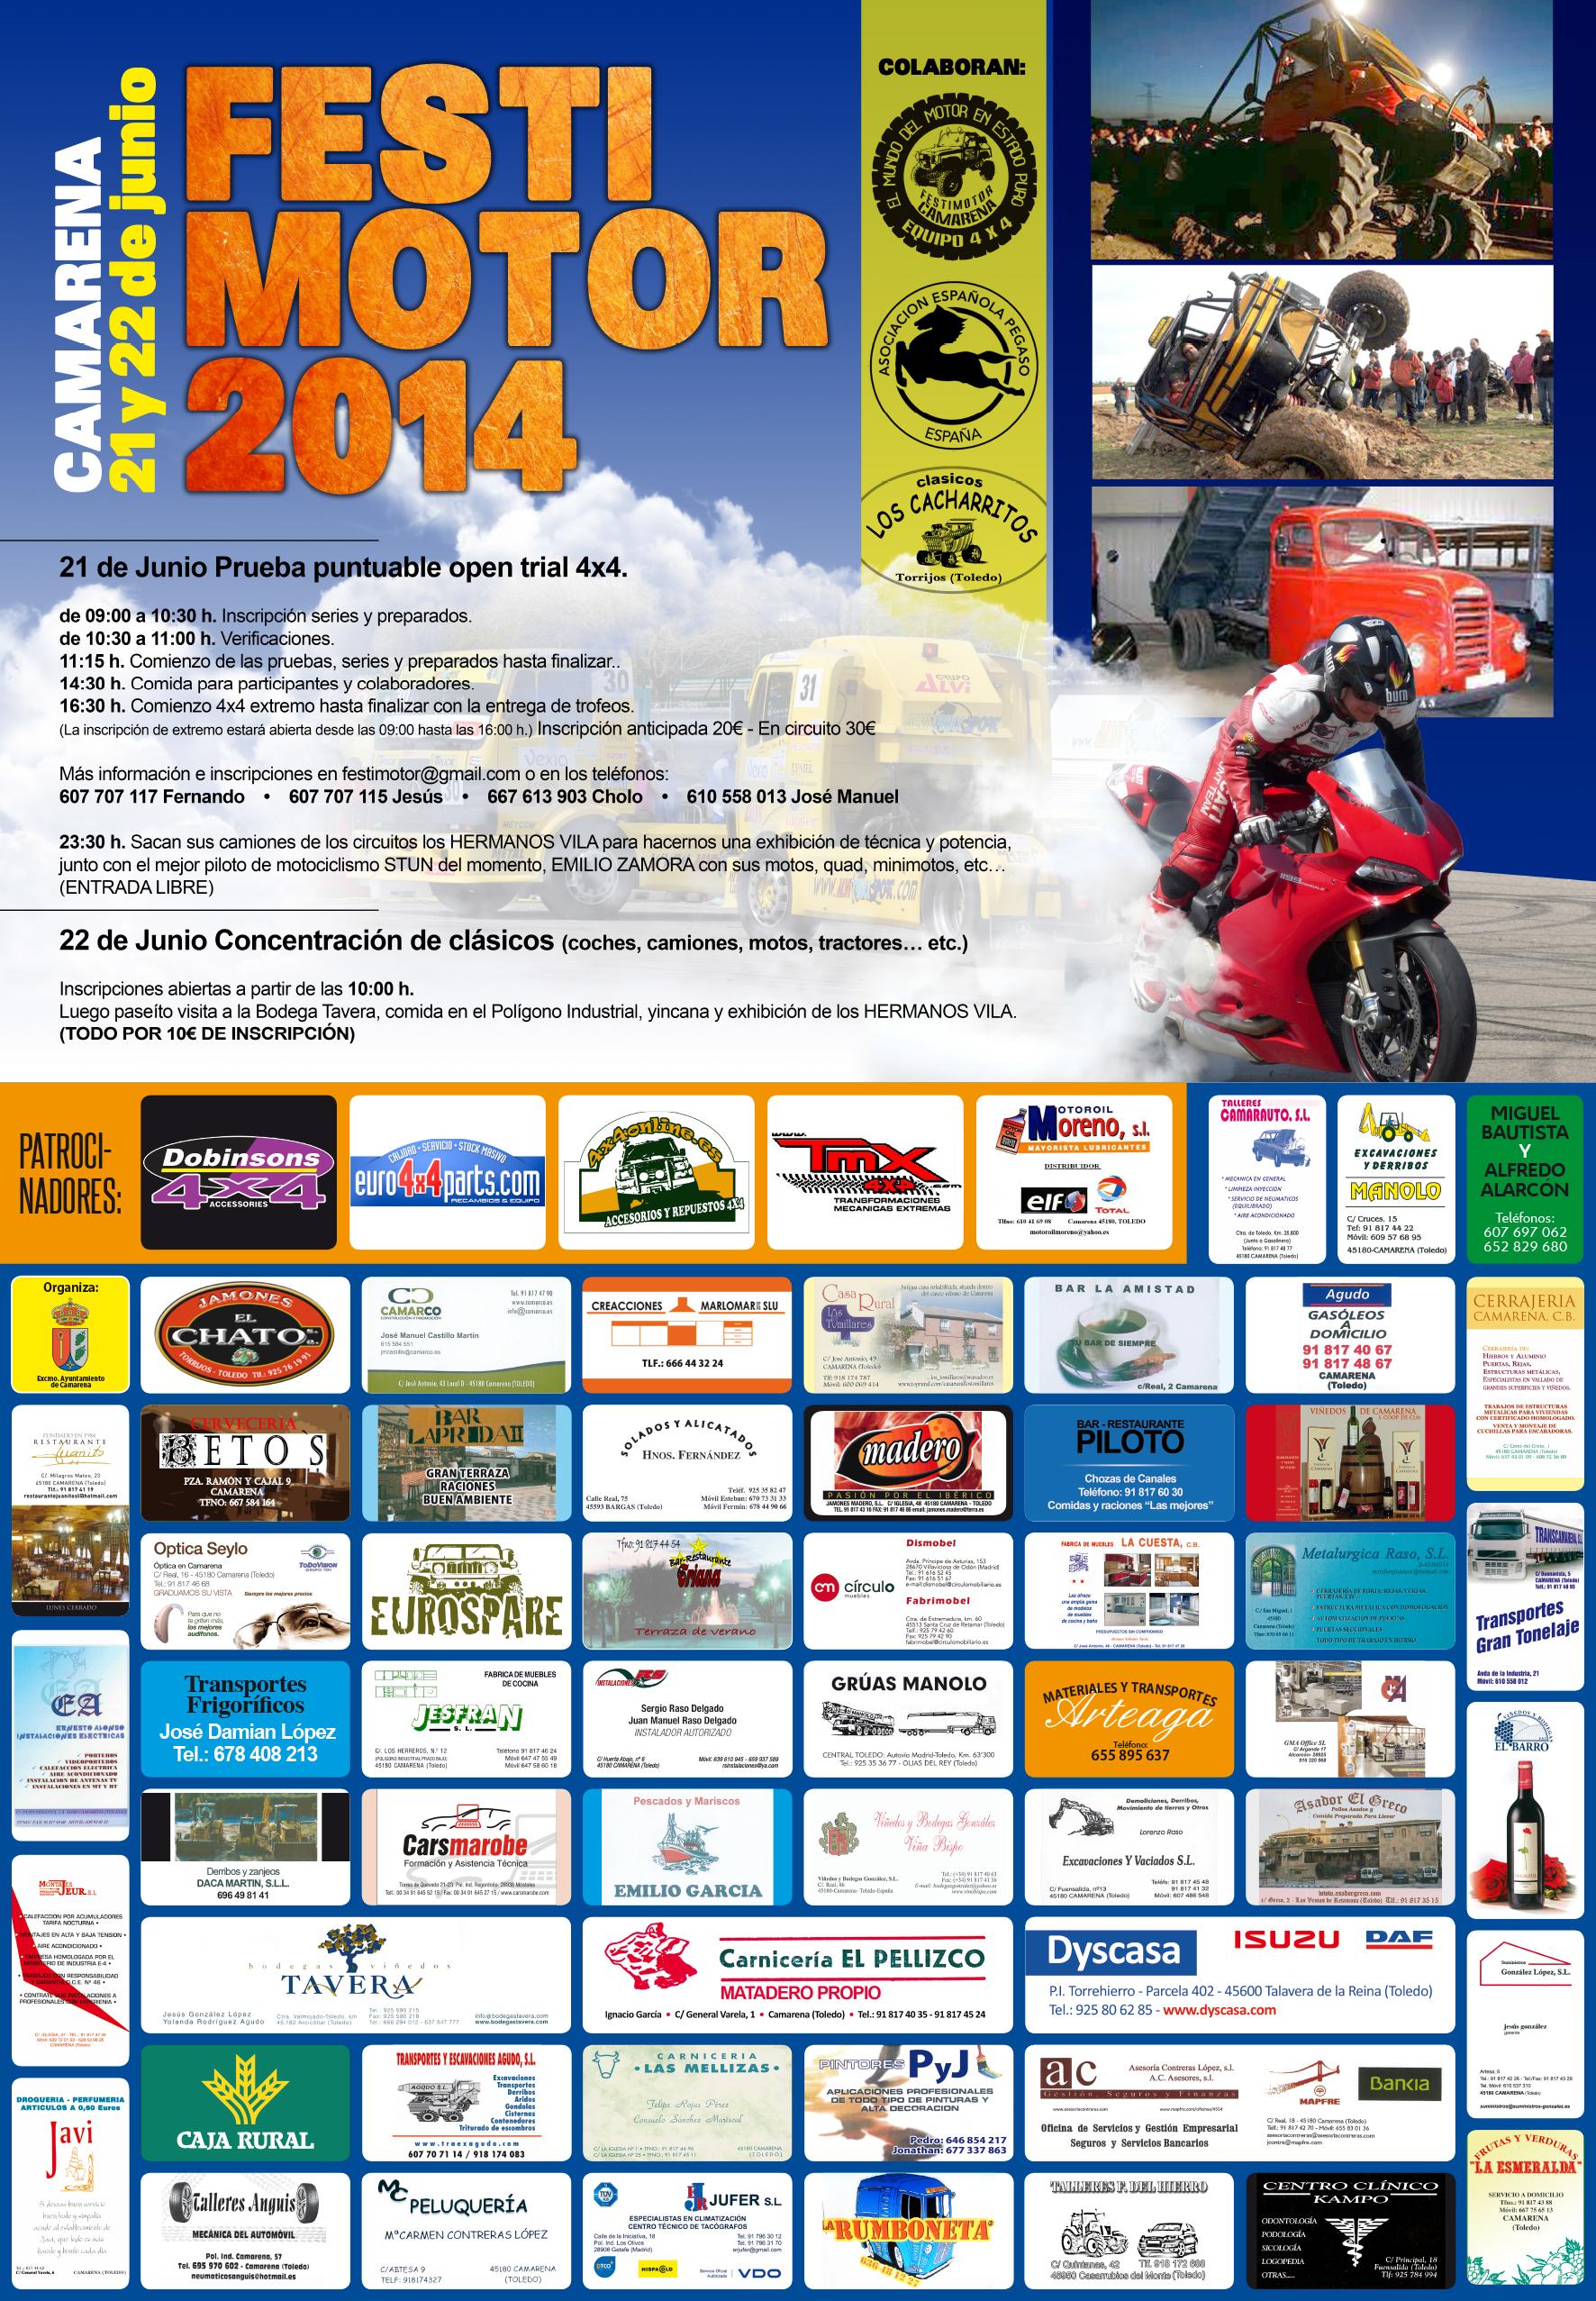 FESTIMOTOR 2014 Cartel 70x100 (1)